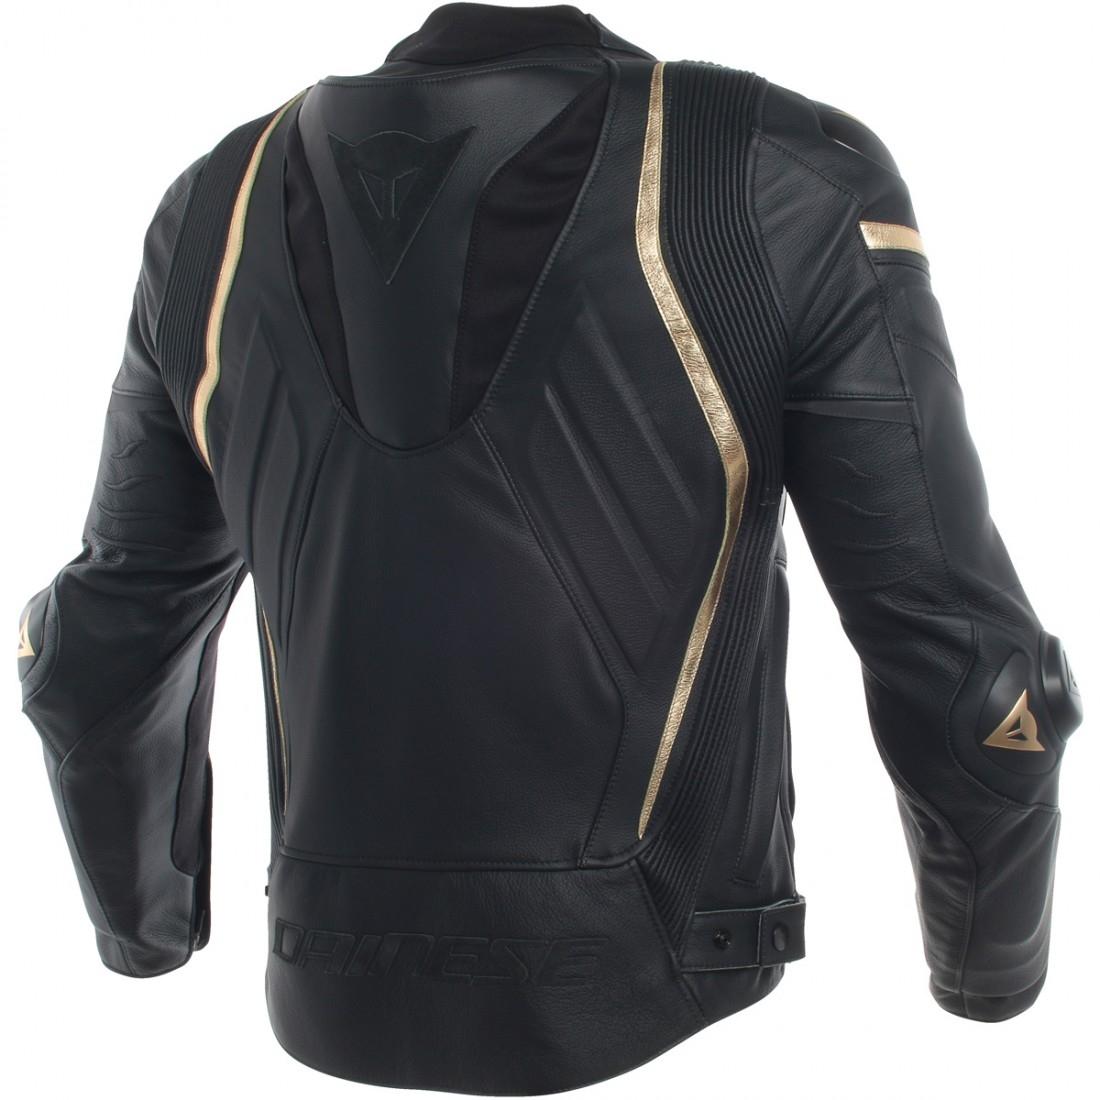 41262517684 Blouson DAINESE Mugello Anniversario Black   Gold Limited Edition ...